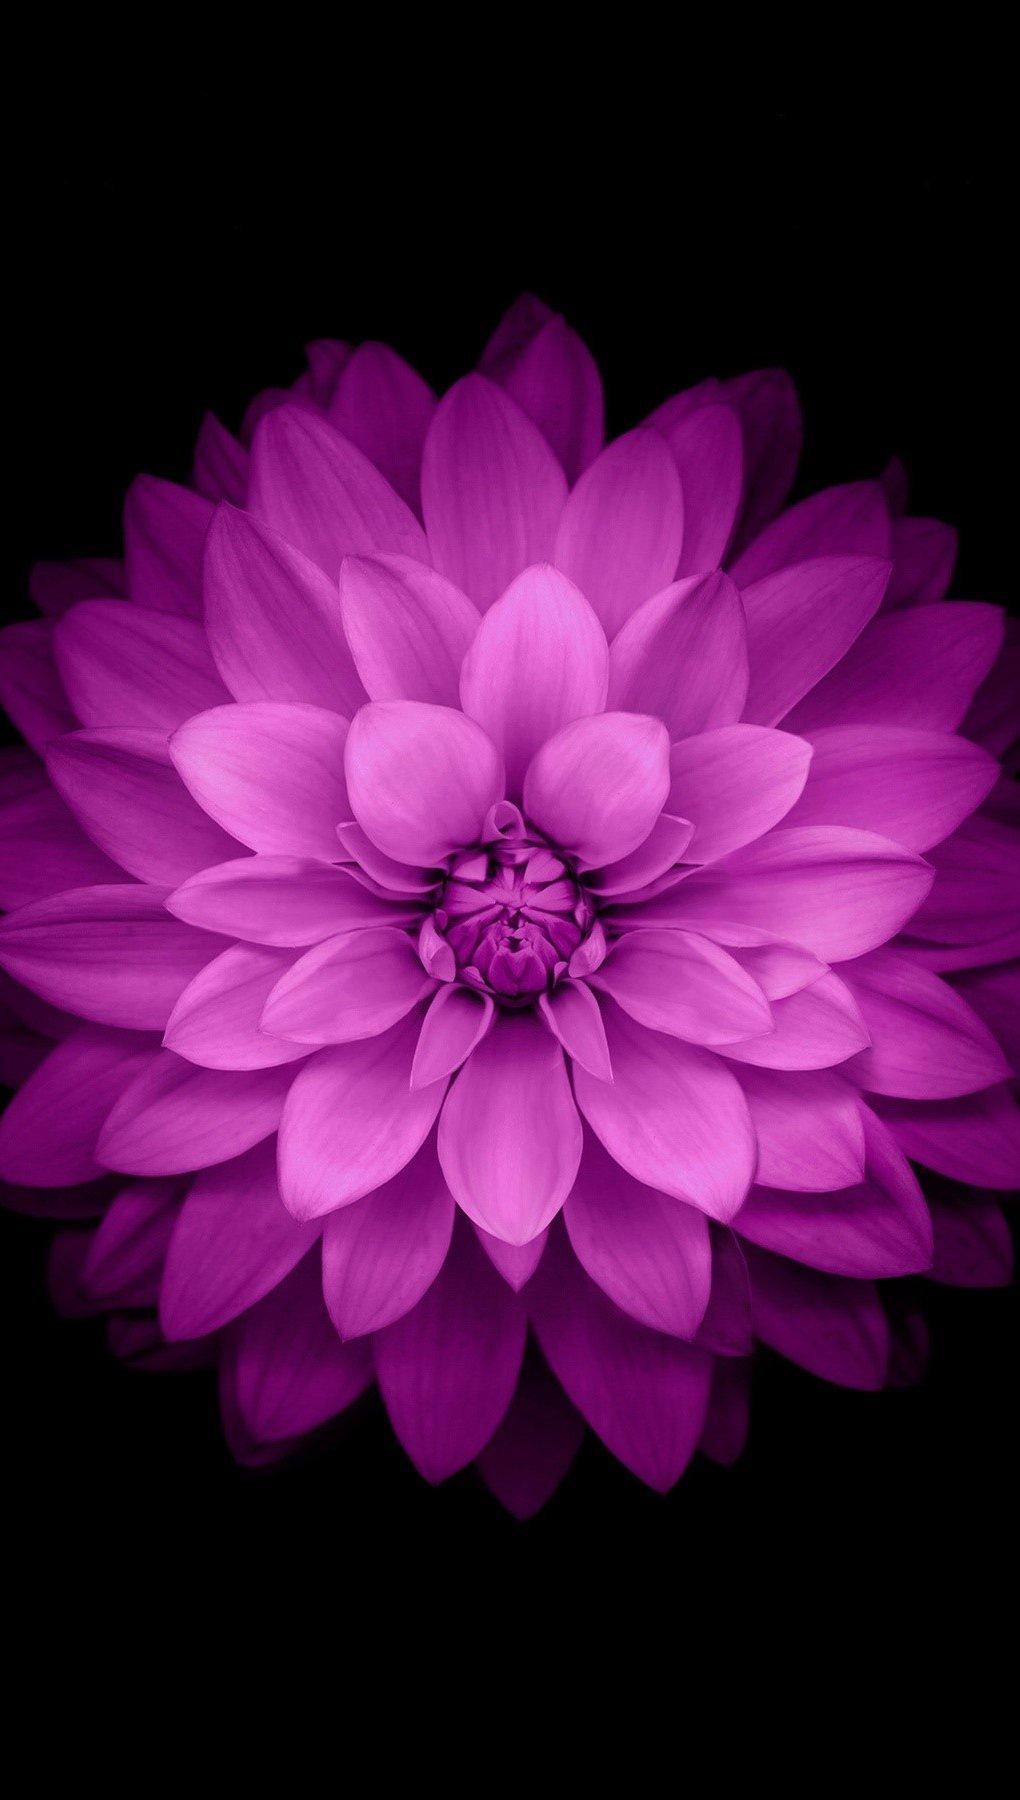 Fondos de pantalla Pétalos de flor Vertical